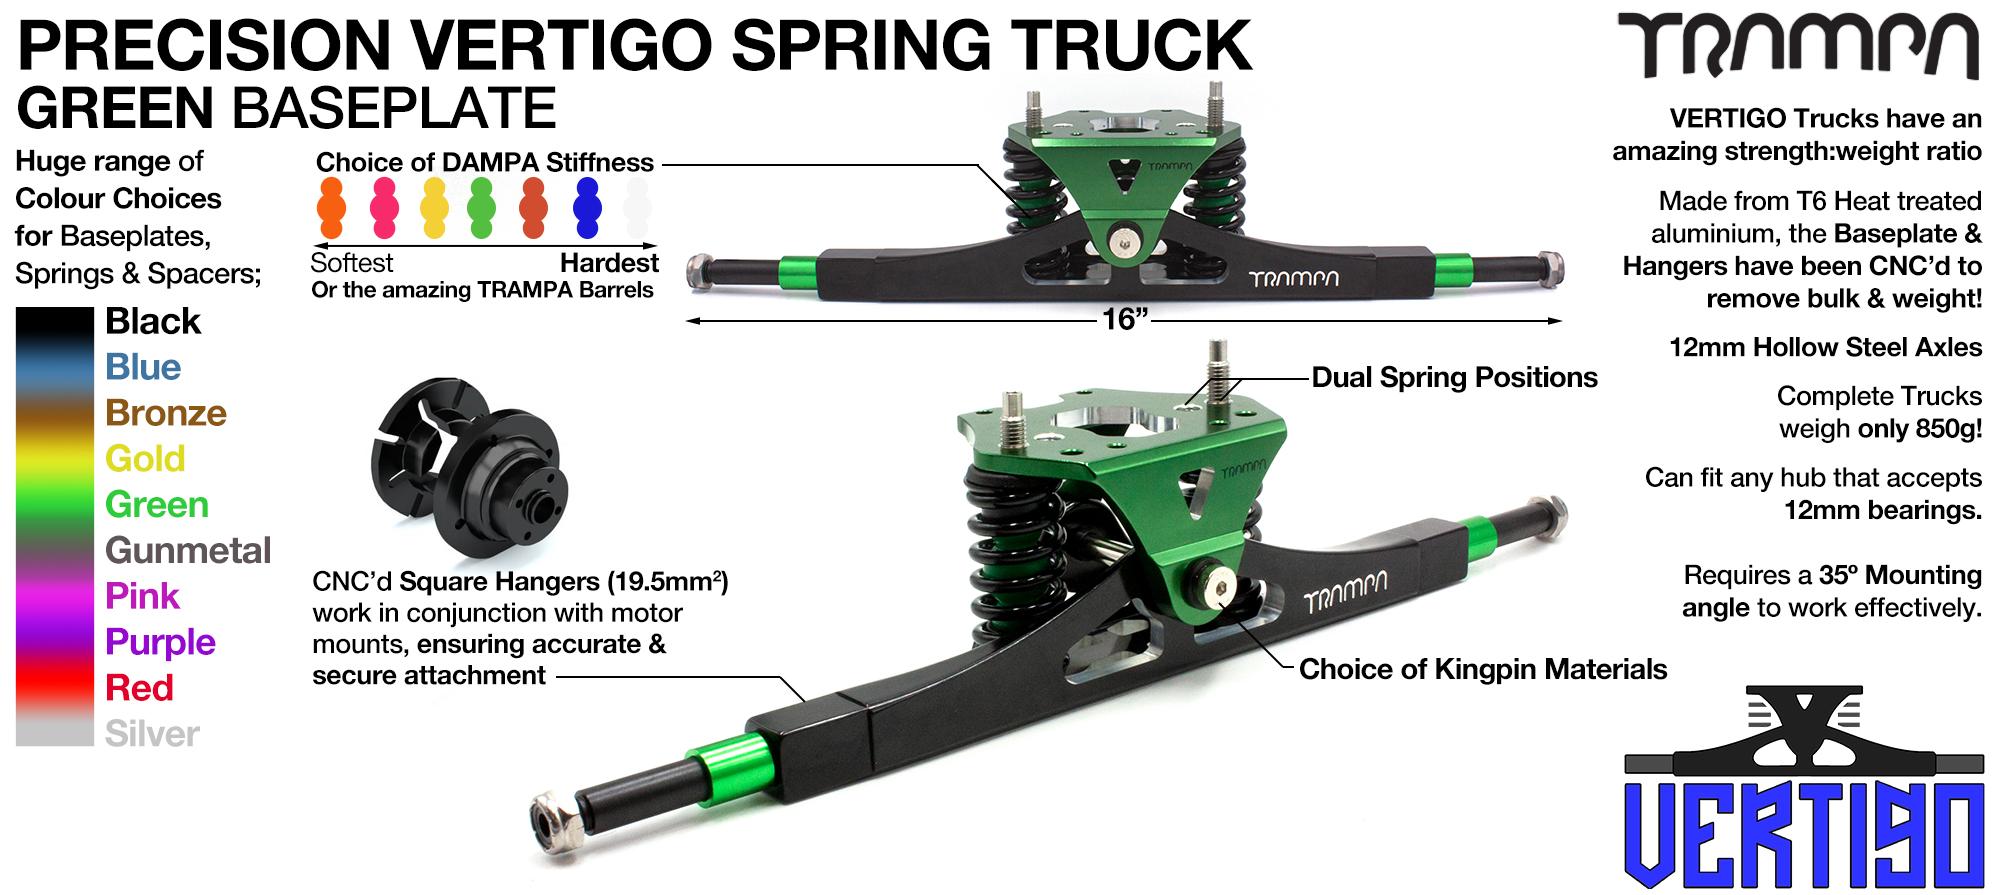 Vertigo Truck - 12mm HOLLOW Axles with GUNMETAL CNC baseplate Steel Kingpin TRAMPA Spring Trucks